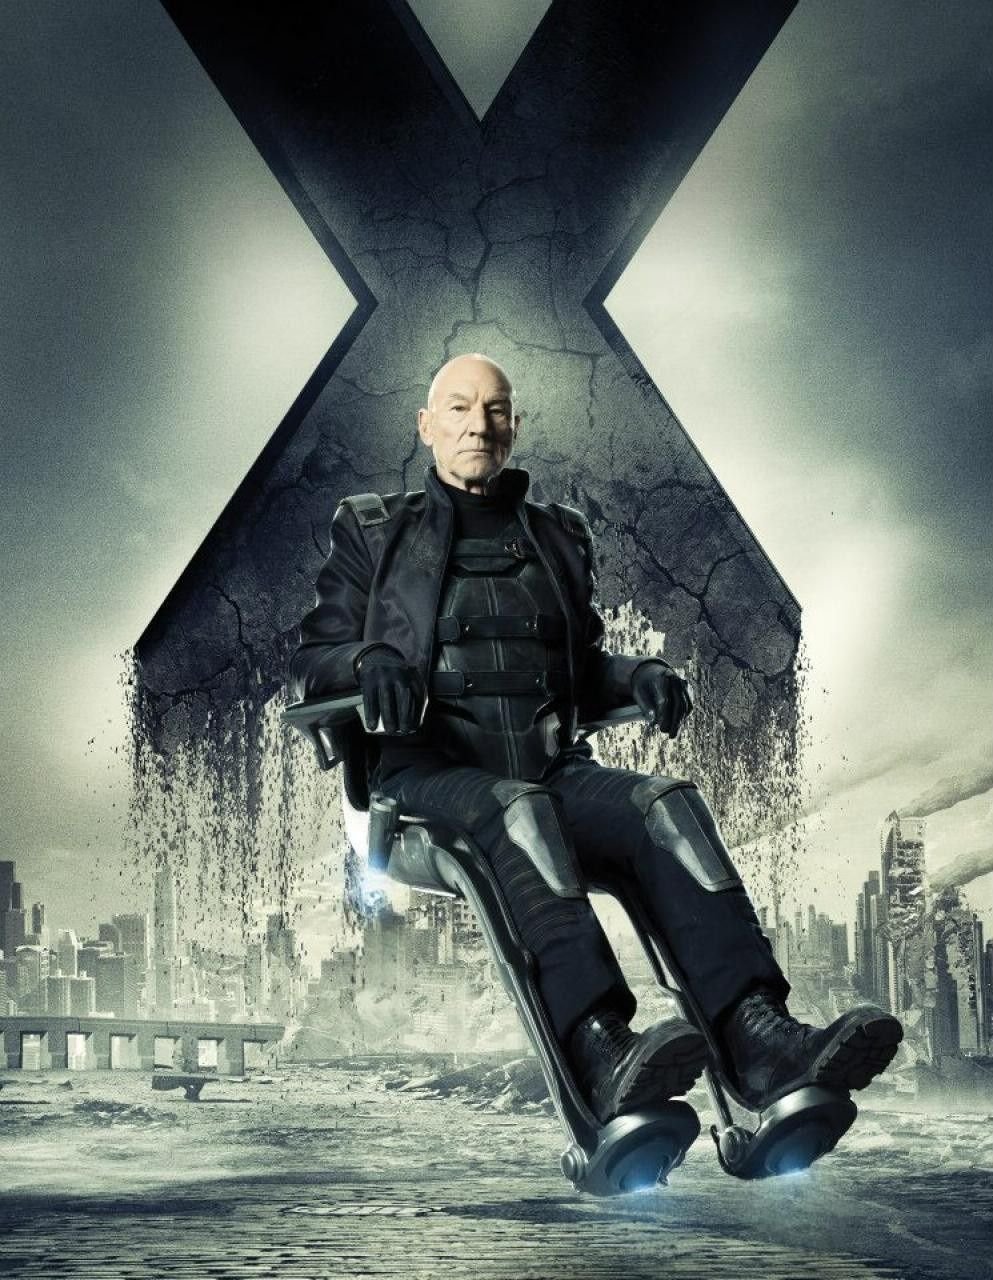 X Men Dias Del Futuro Pasado Days Of Future Past X Men Superhero